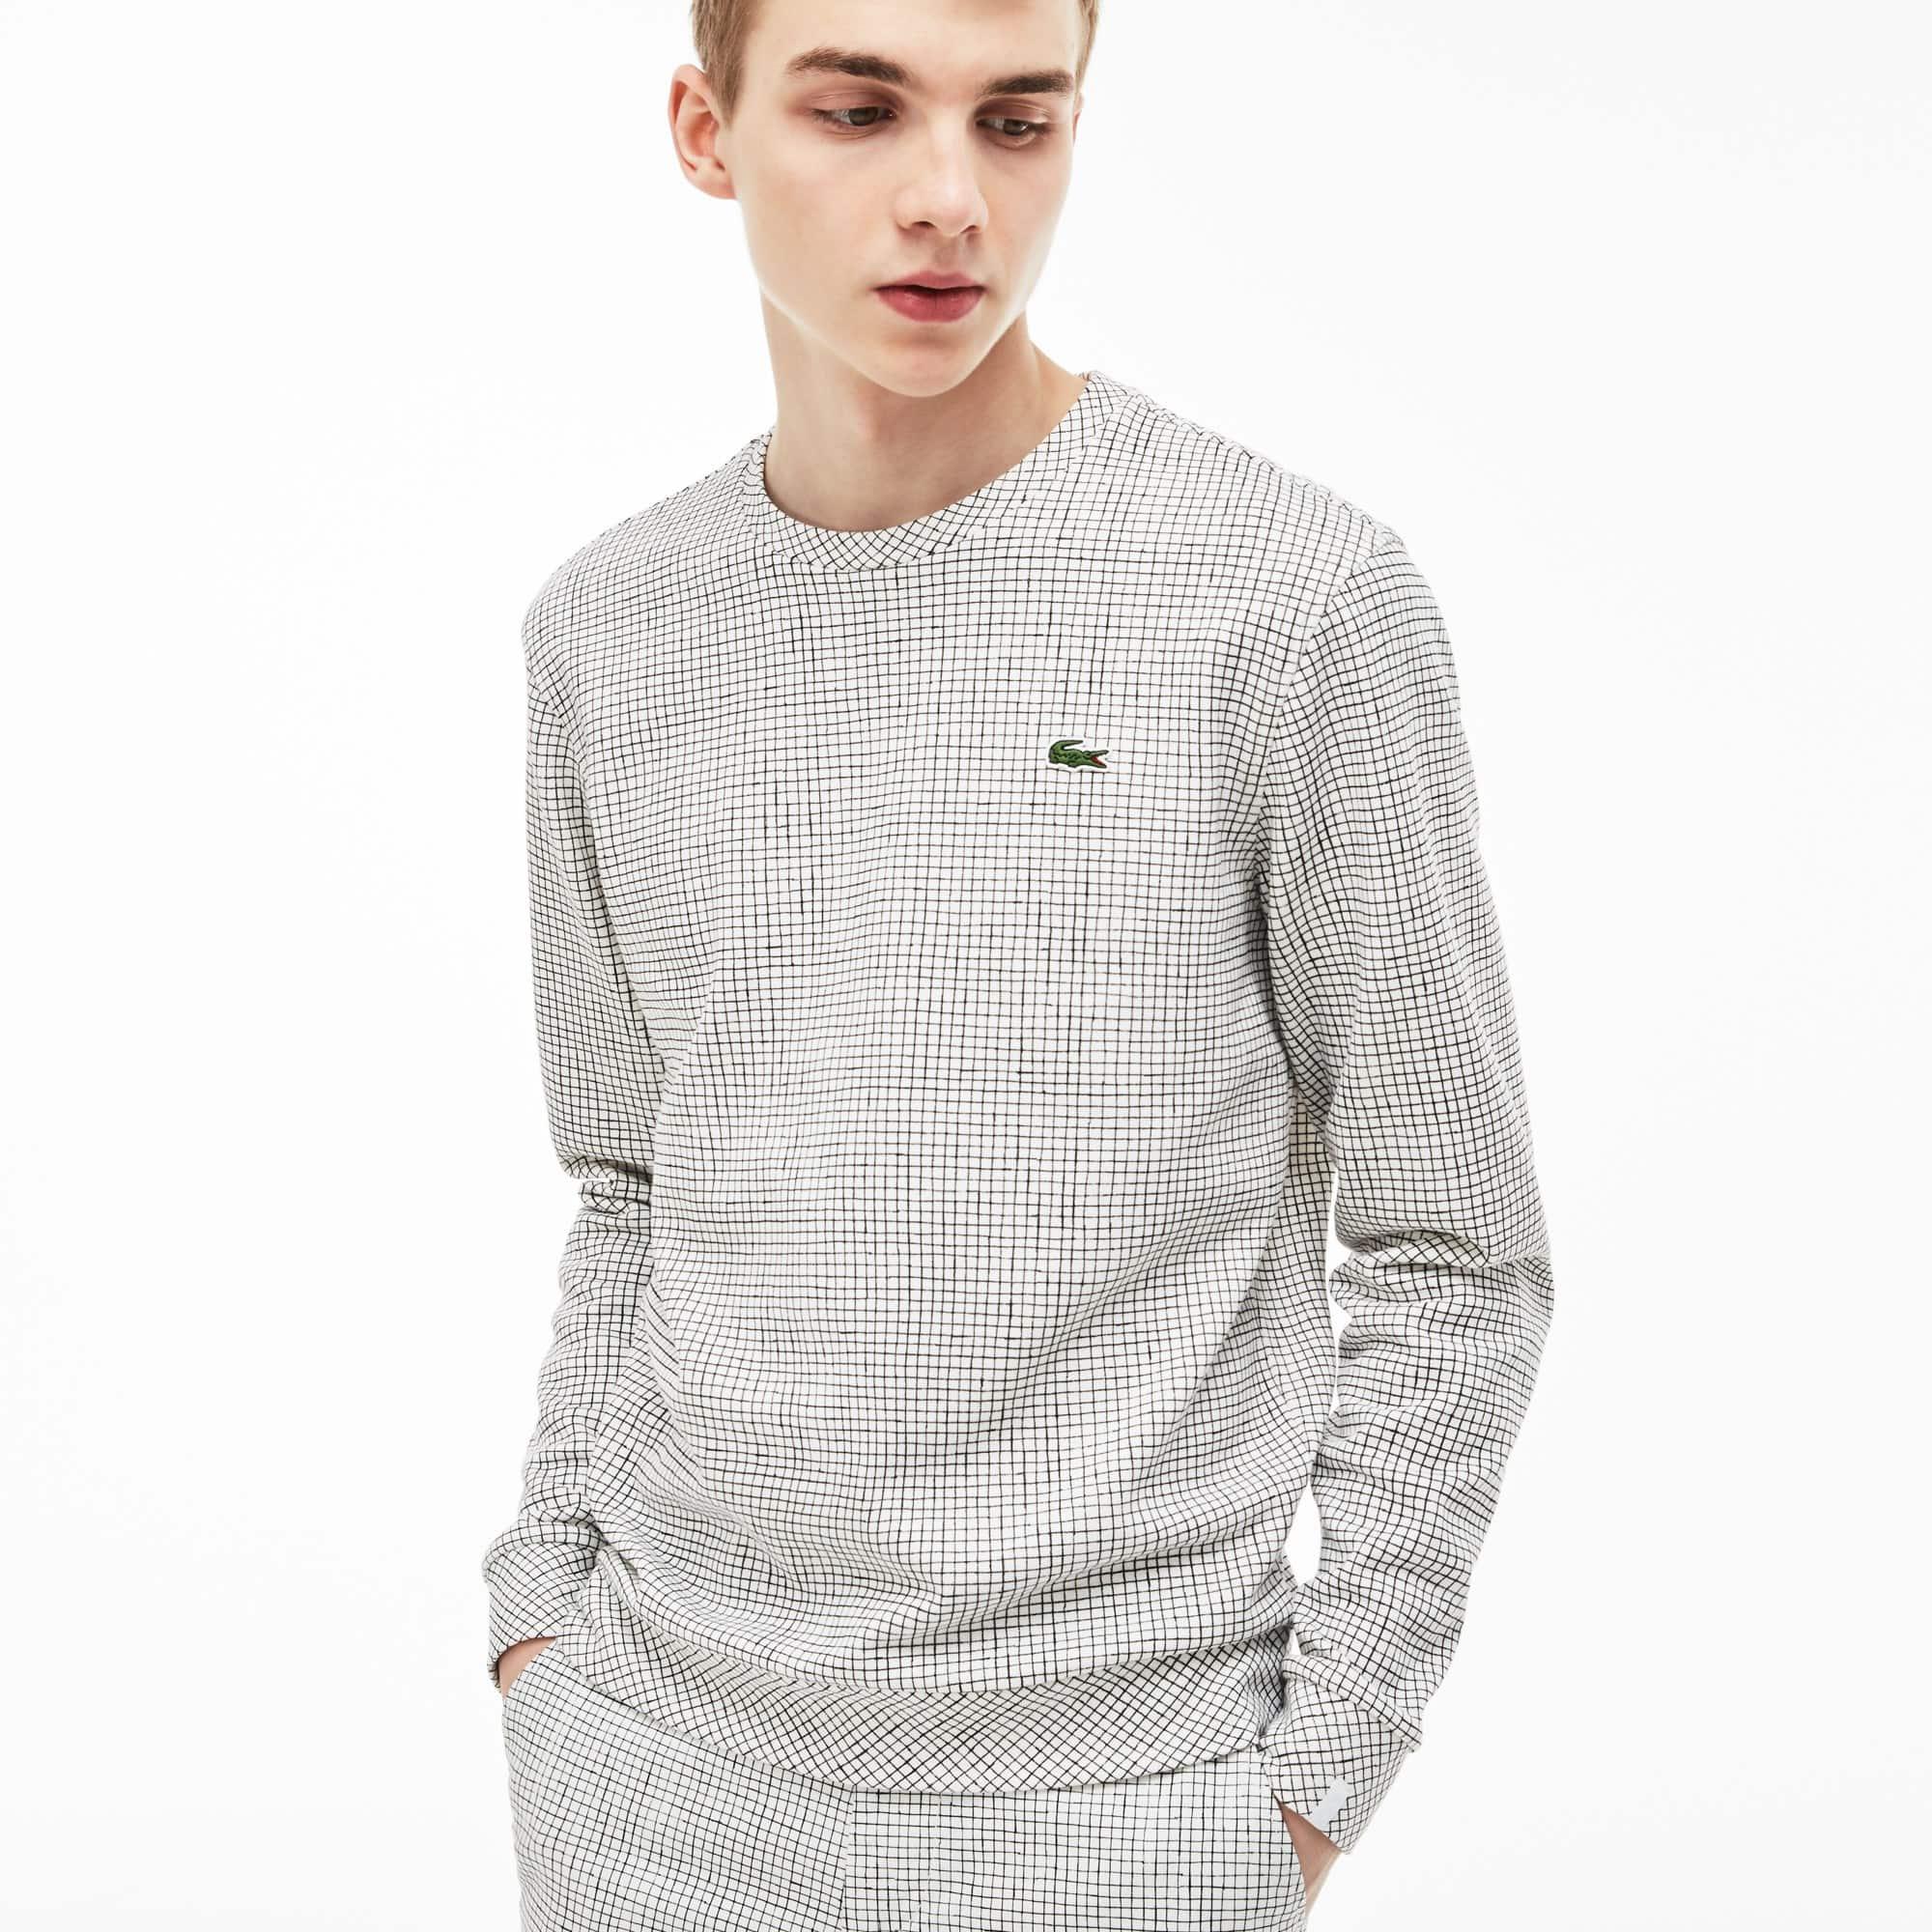 Herren-Rundhals-Sweatshirt aus kariertem Fleece LACOSTE L!VE